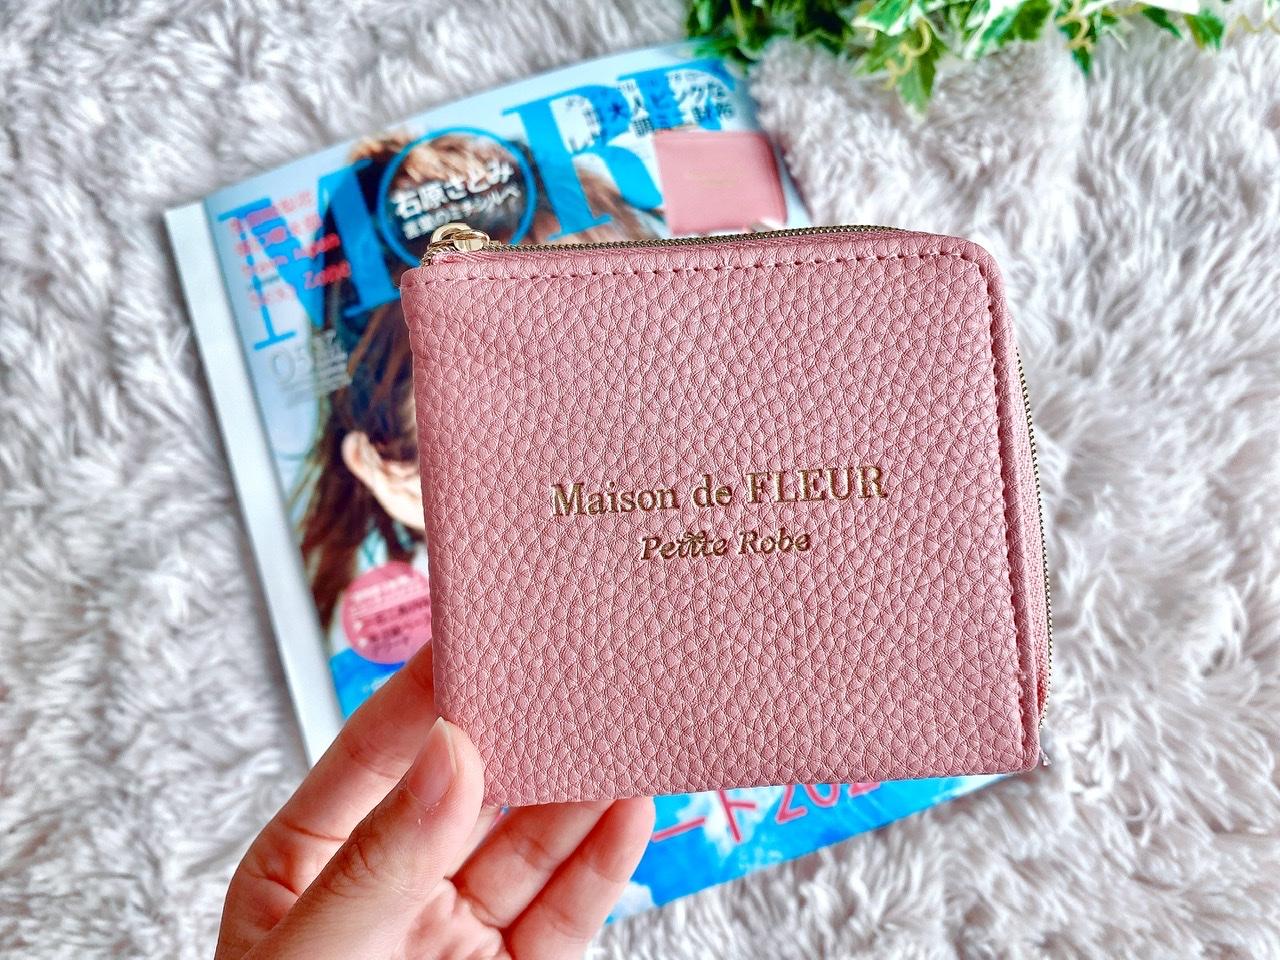 【MORE5月号】今月買うべき神付録!《メゾンドフルール》レザー調ミニ財布が可愛すぎ♡_2